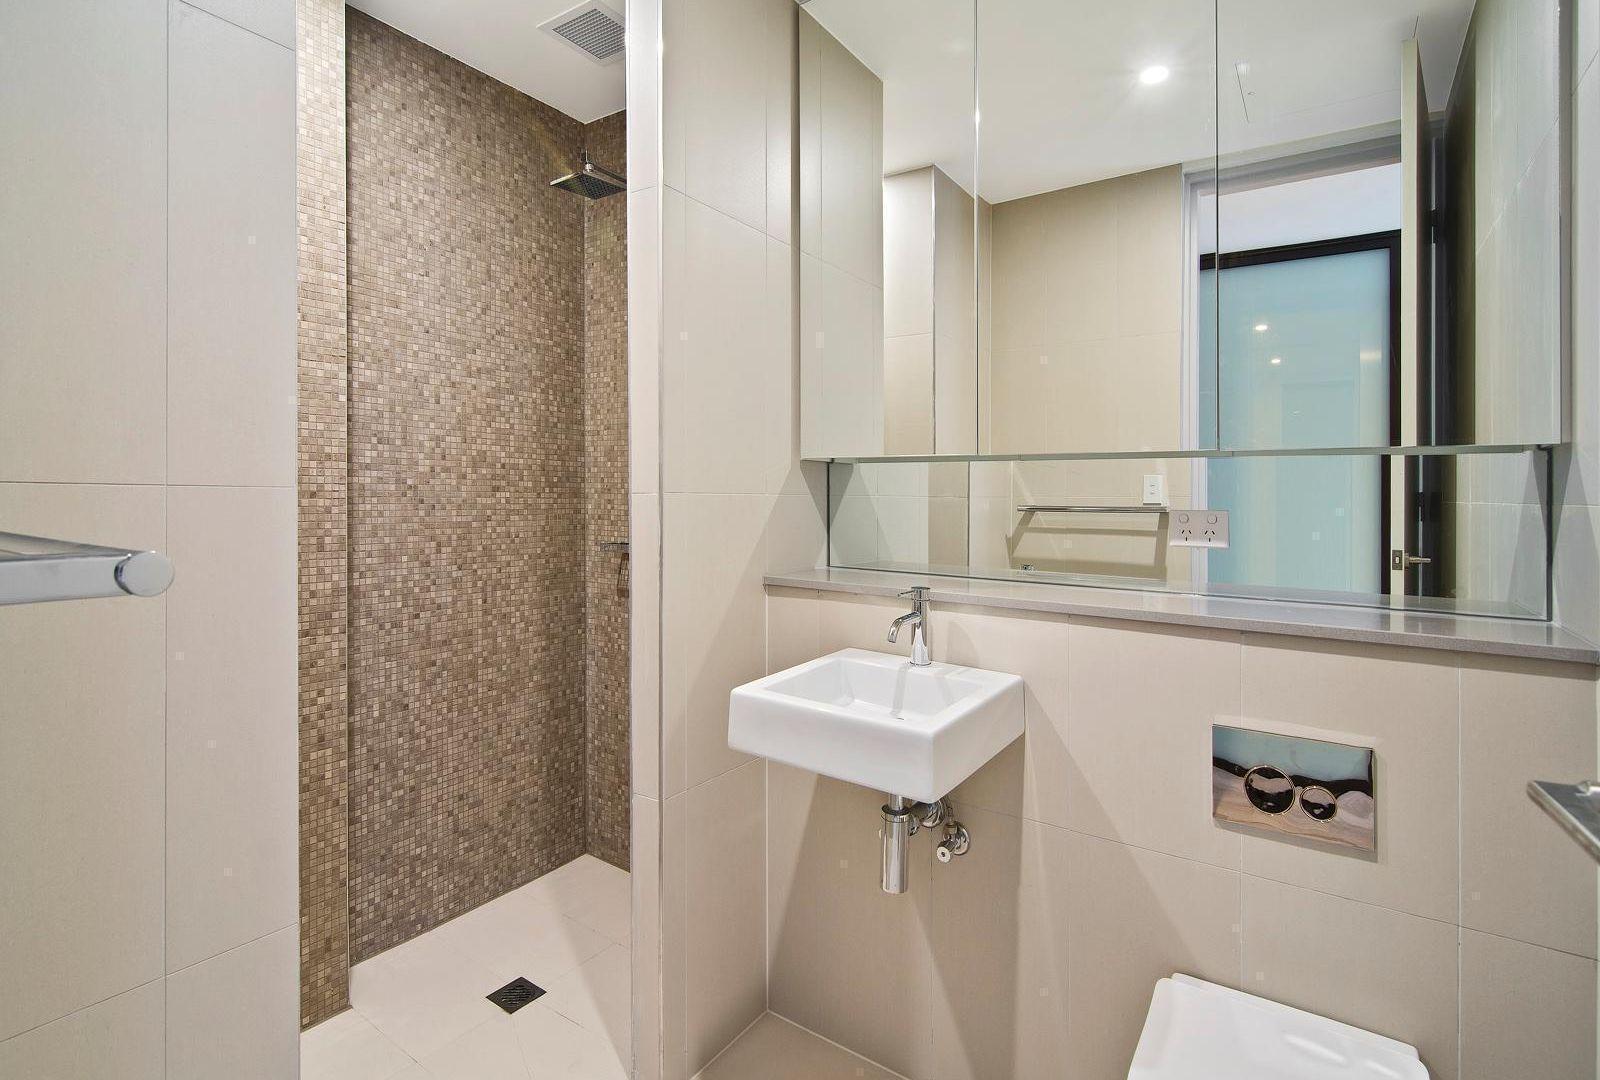 4/4-5 Gurrigal Street, Mosman NSW 2088, Image 1